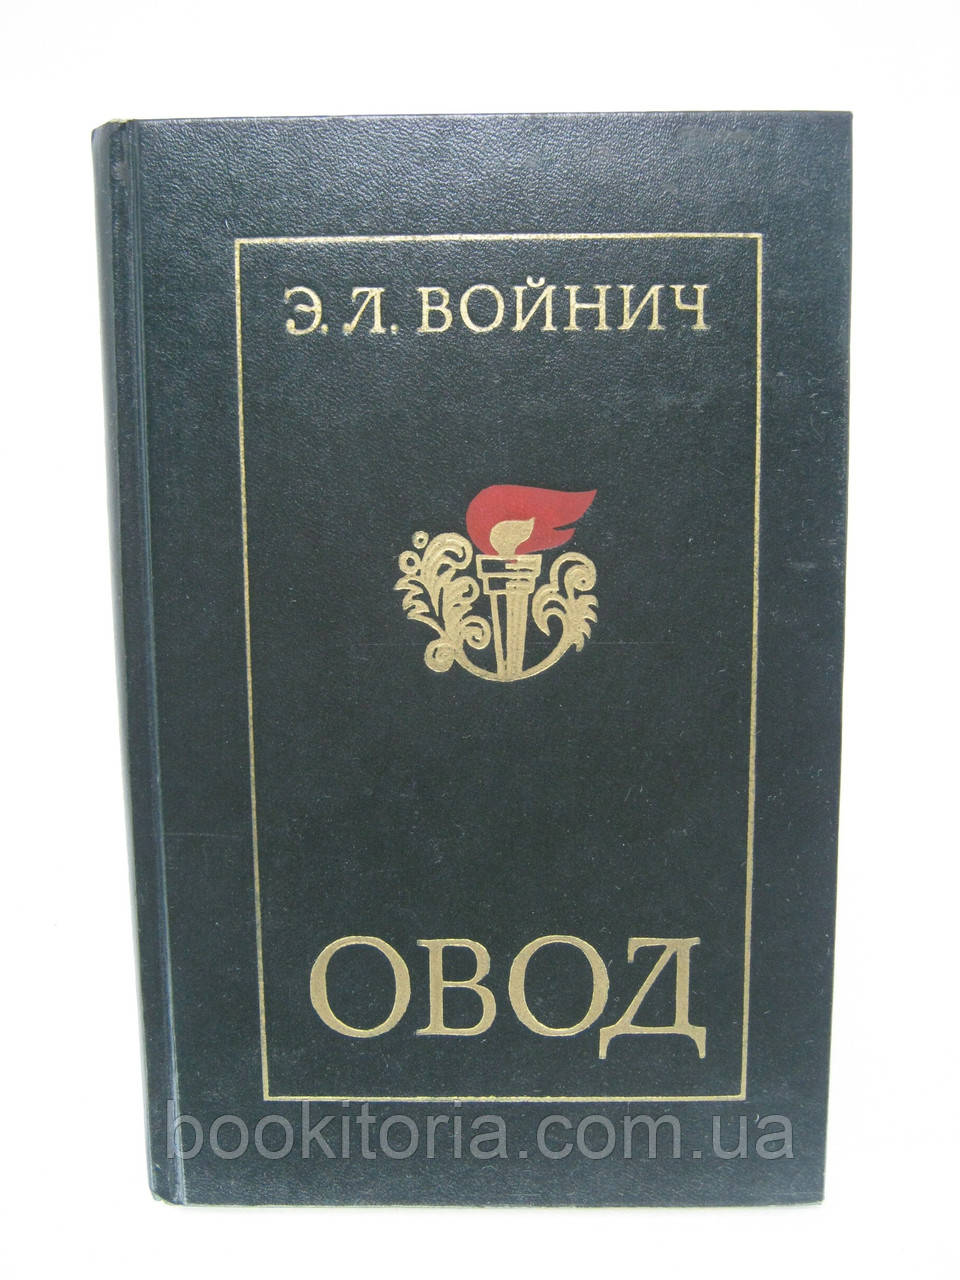 Войнич Э.Л. Овод (б/у).